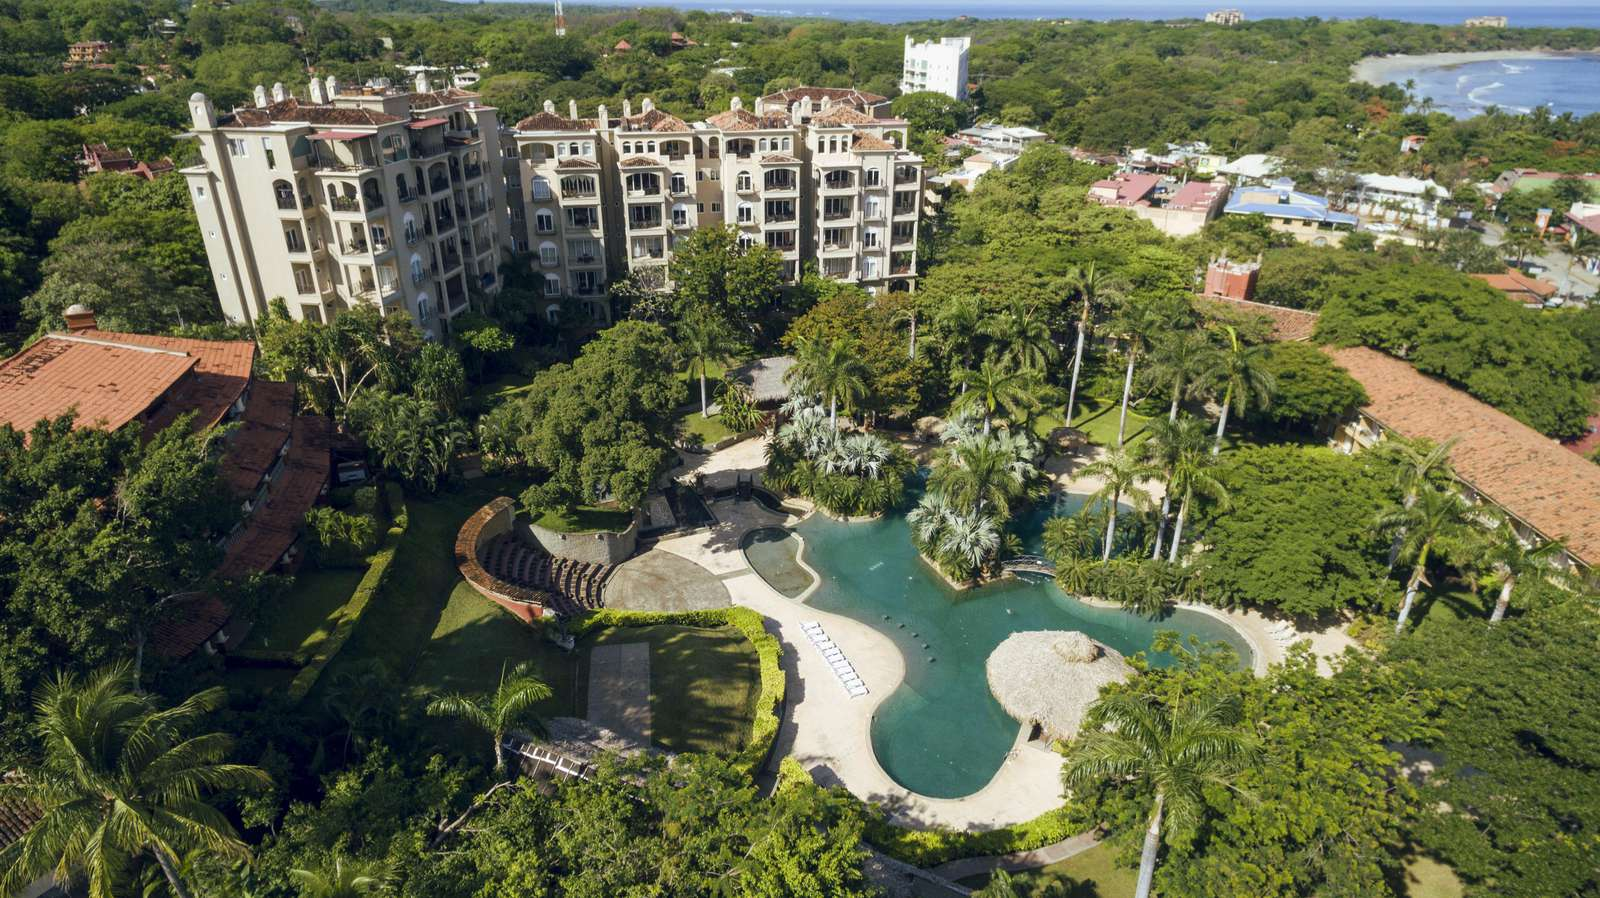 Aerial view of the Matapalo building and Diria Resort Pool